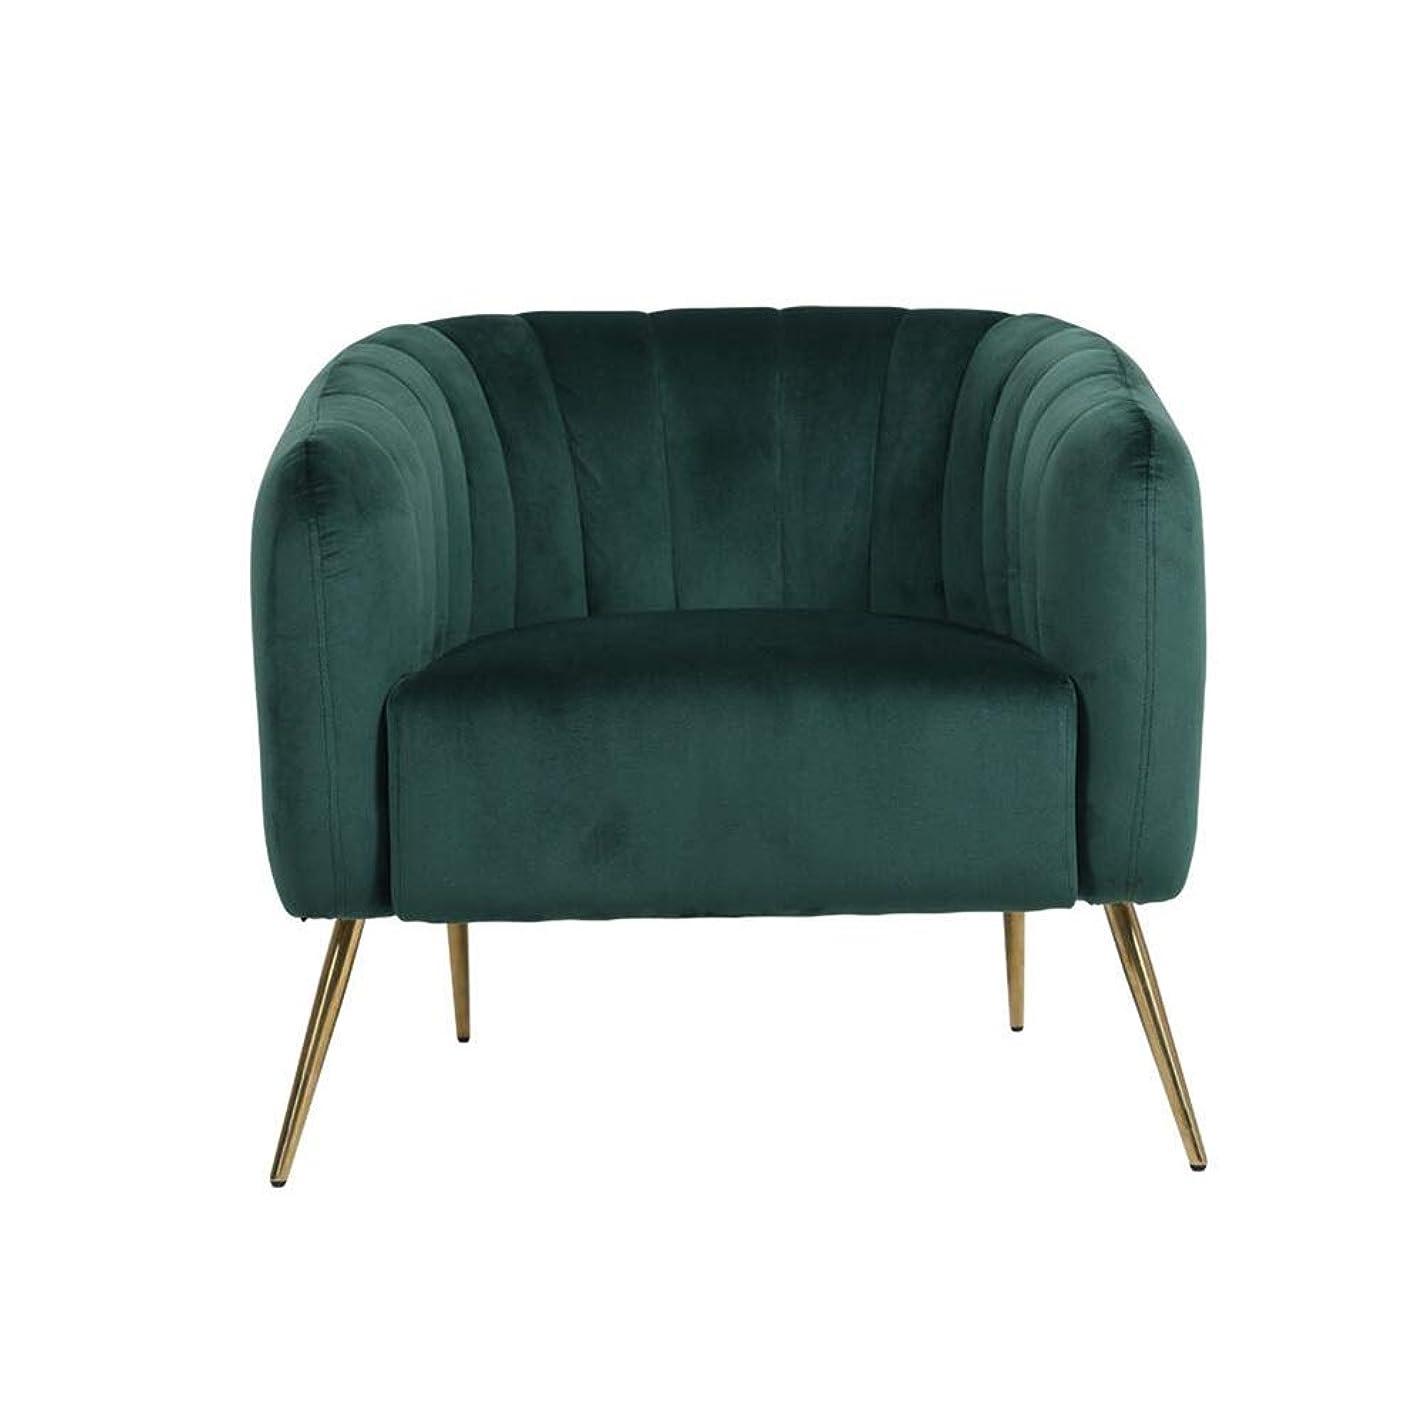 YQQ-怠惰なソファ 現代のベルベット随時アームチェア浴槽椅子ラウンジチェア用リビングルーム寝室レセプション用固体金属脚 (Color : Green)